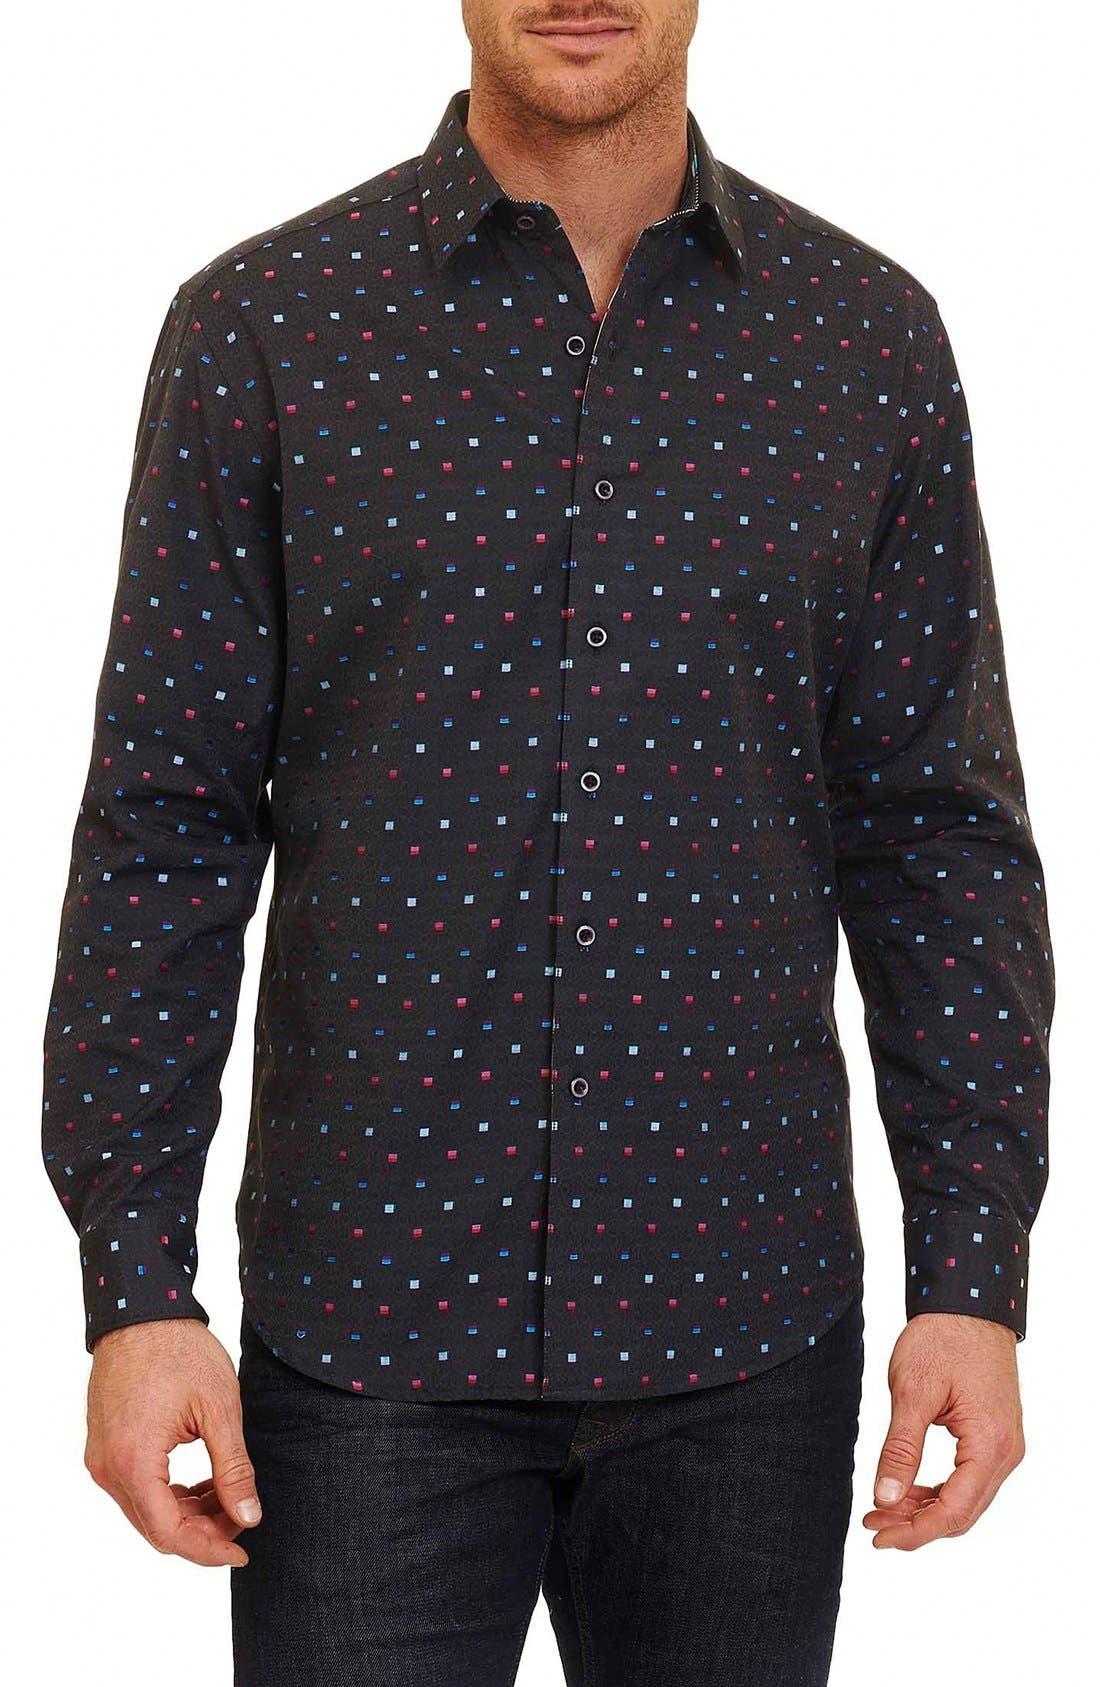 Orion Arm Classic Fit Sport Shirt,                         Main,                         color, Charcoal